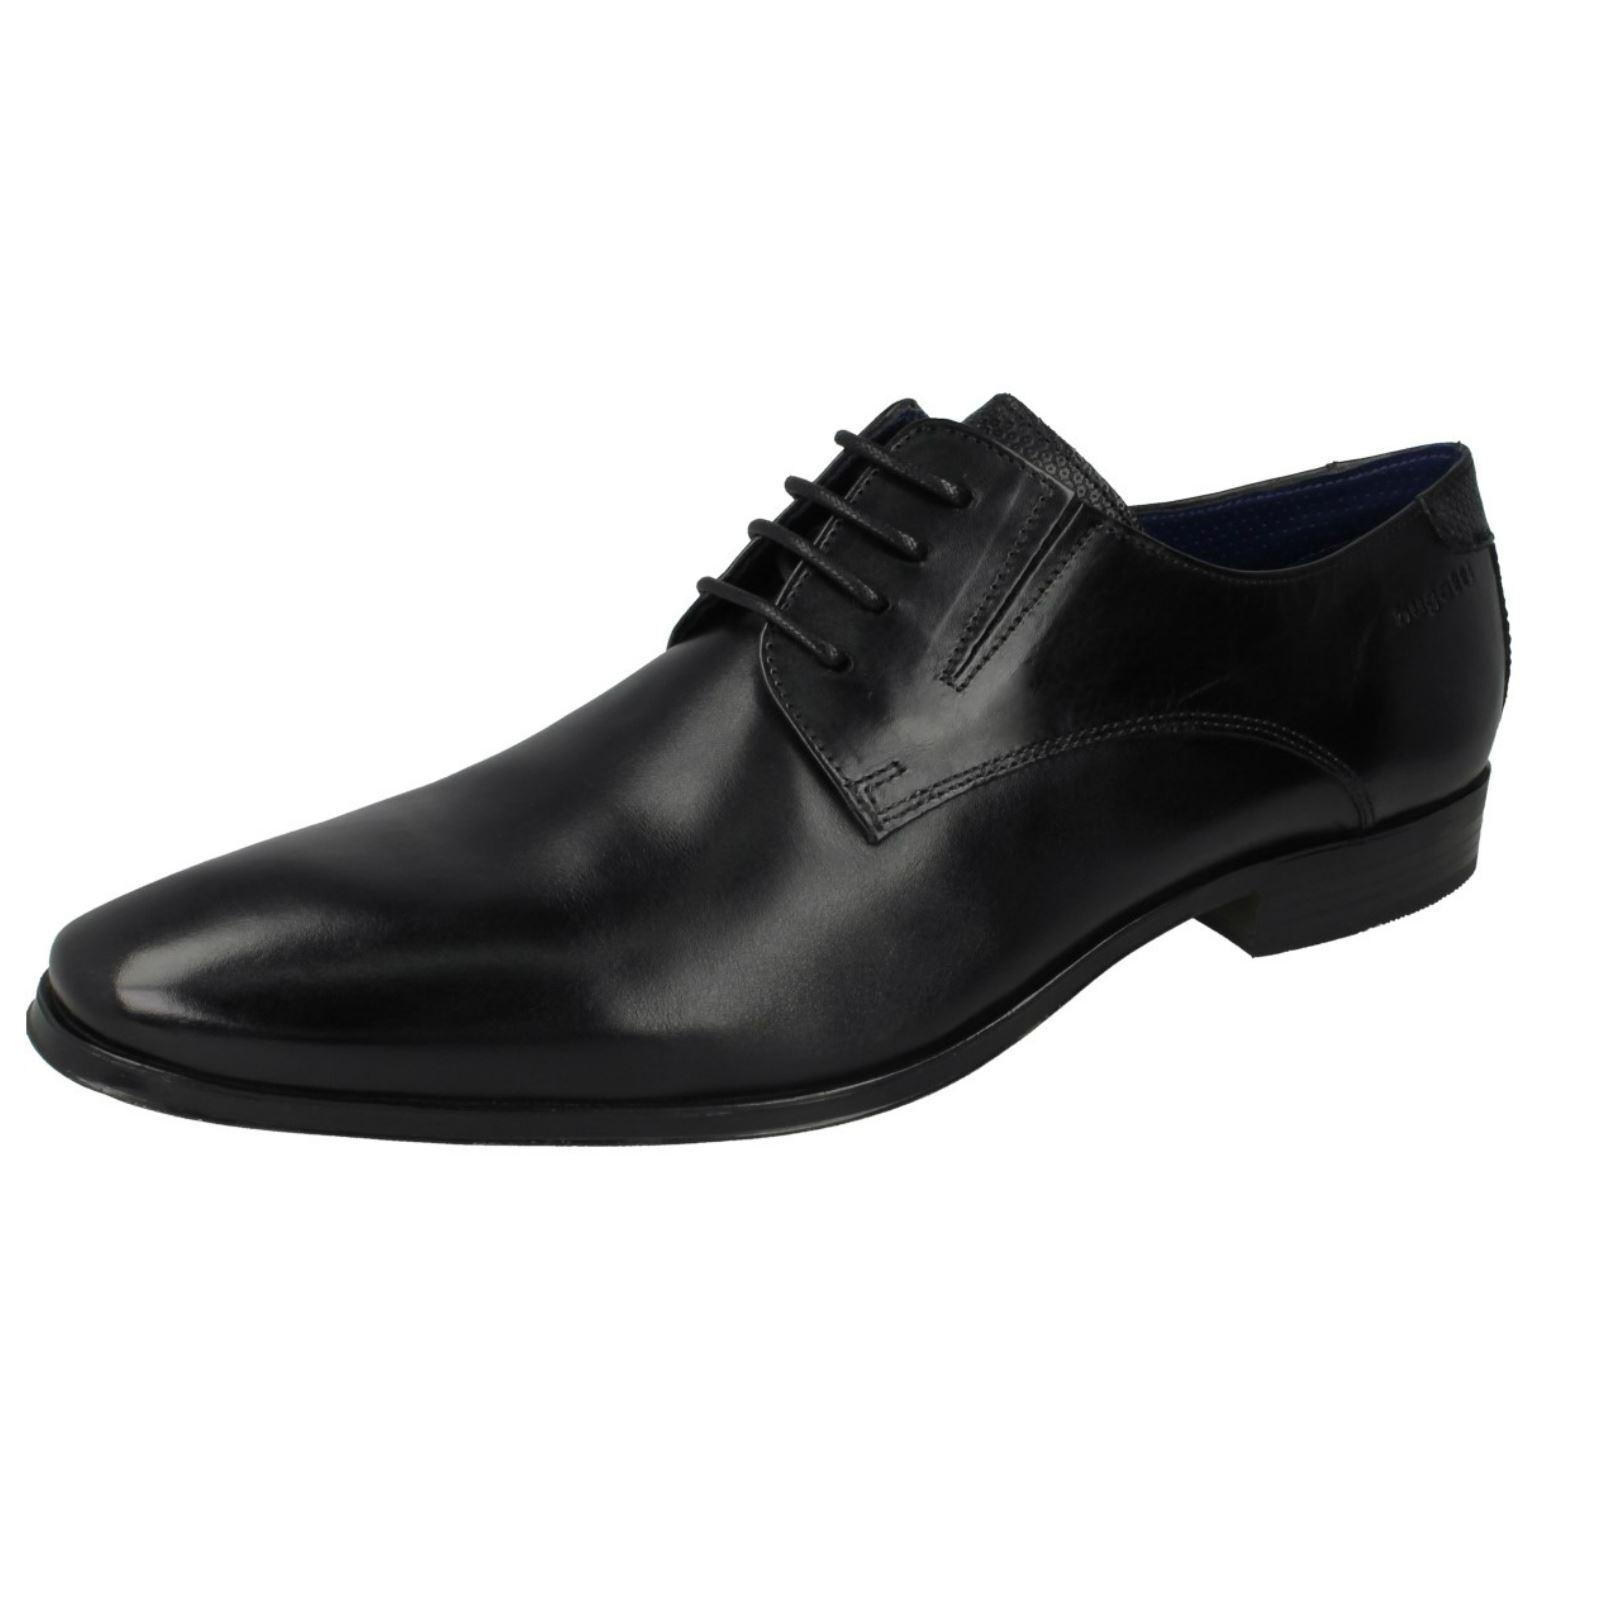 Mens Bugatti Formal shoes - 312-42002